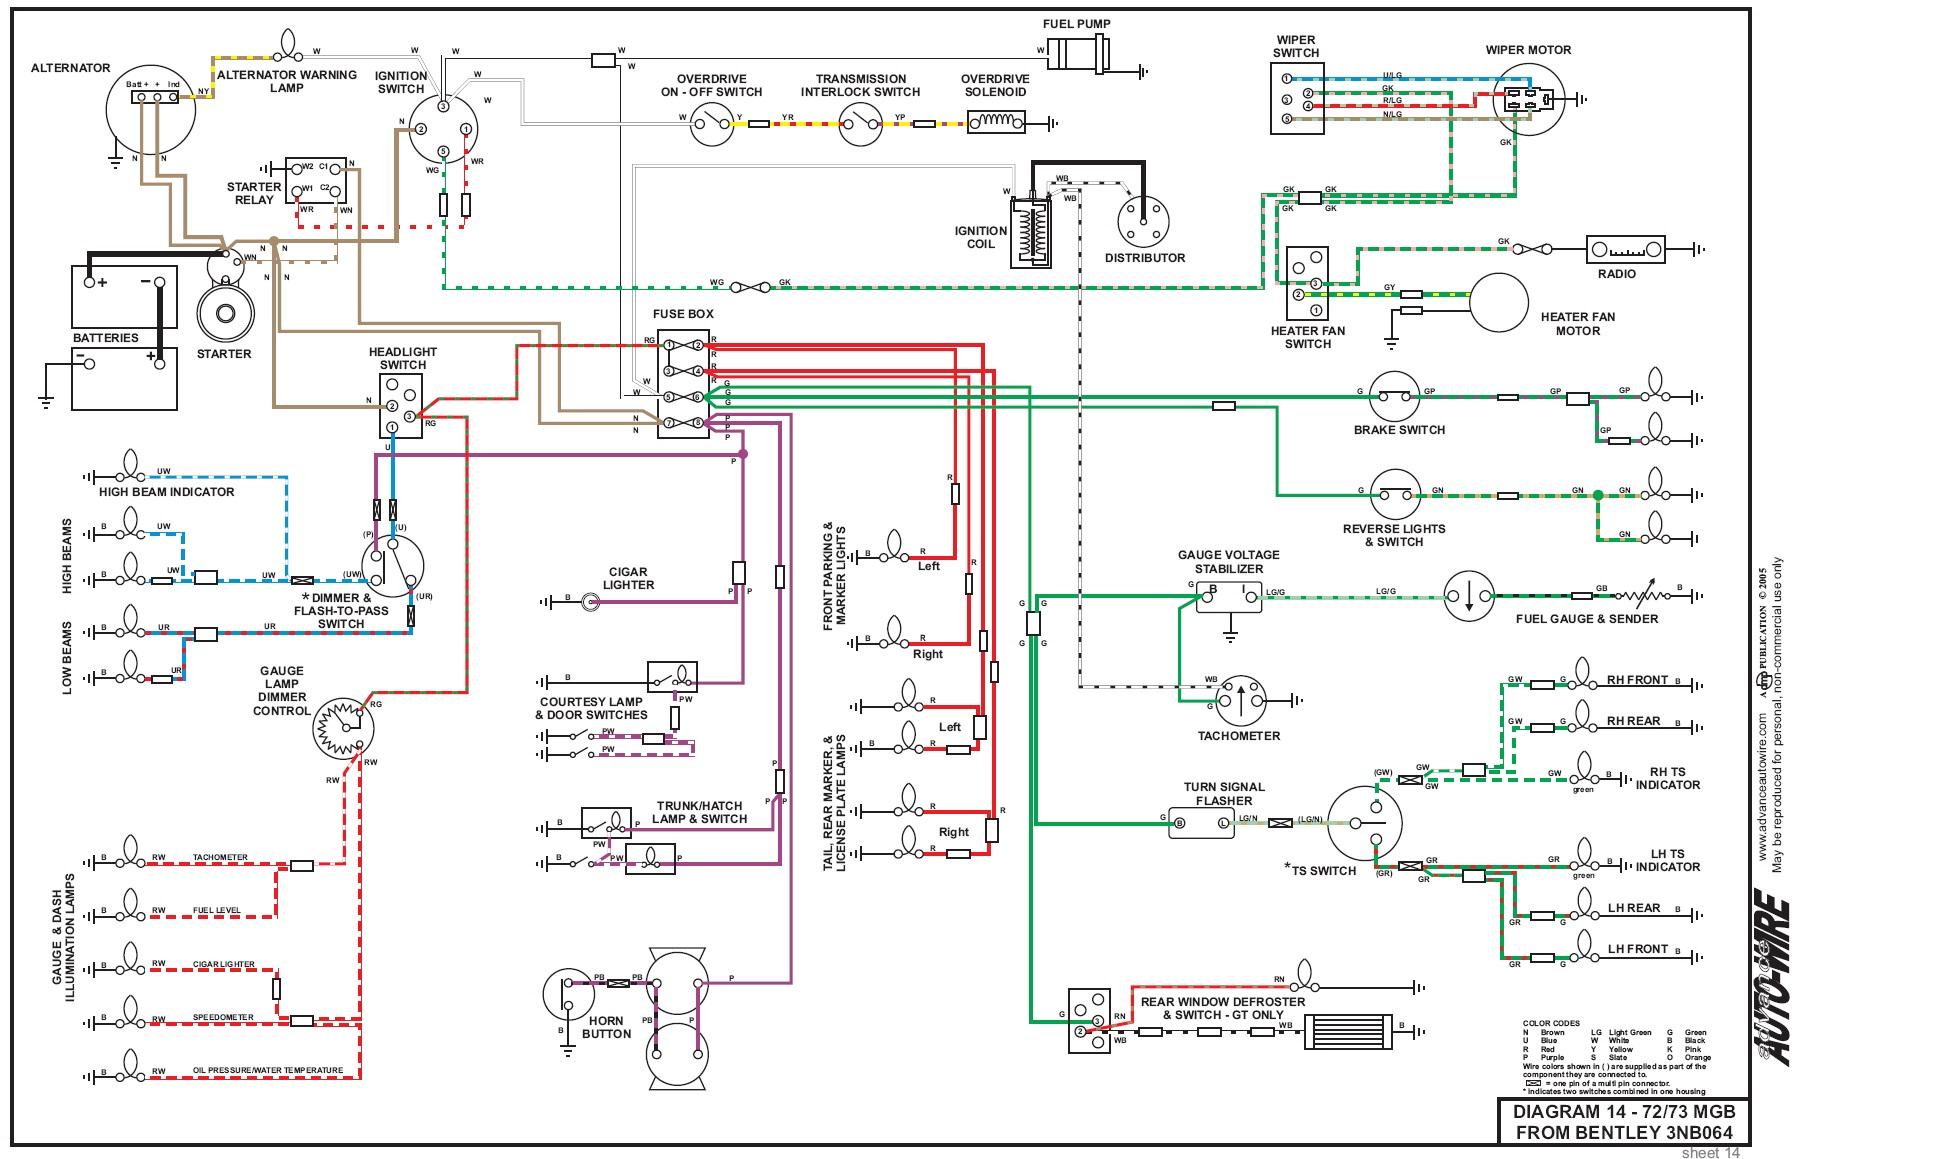 77 Mgb Wiring Diagram - Wiring Diagram Save Radio Wiring Diagram For Mgb on